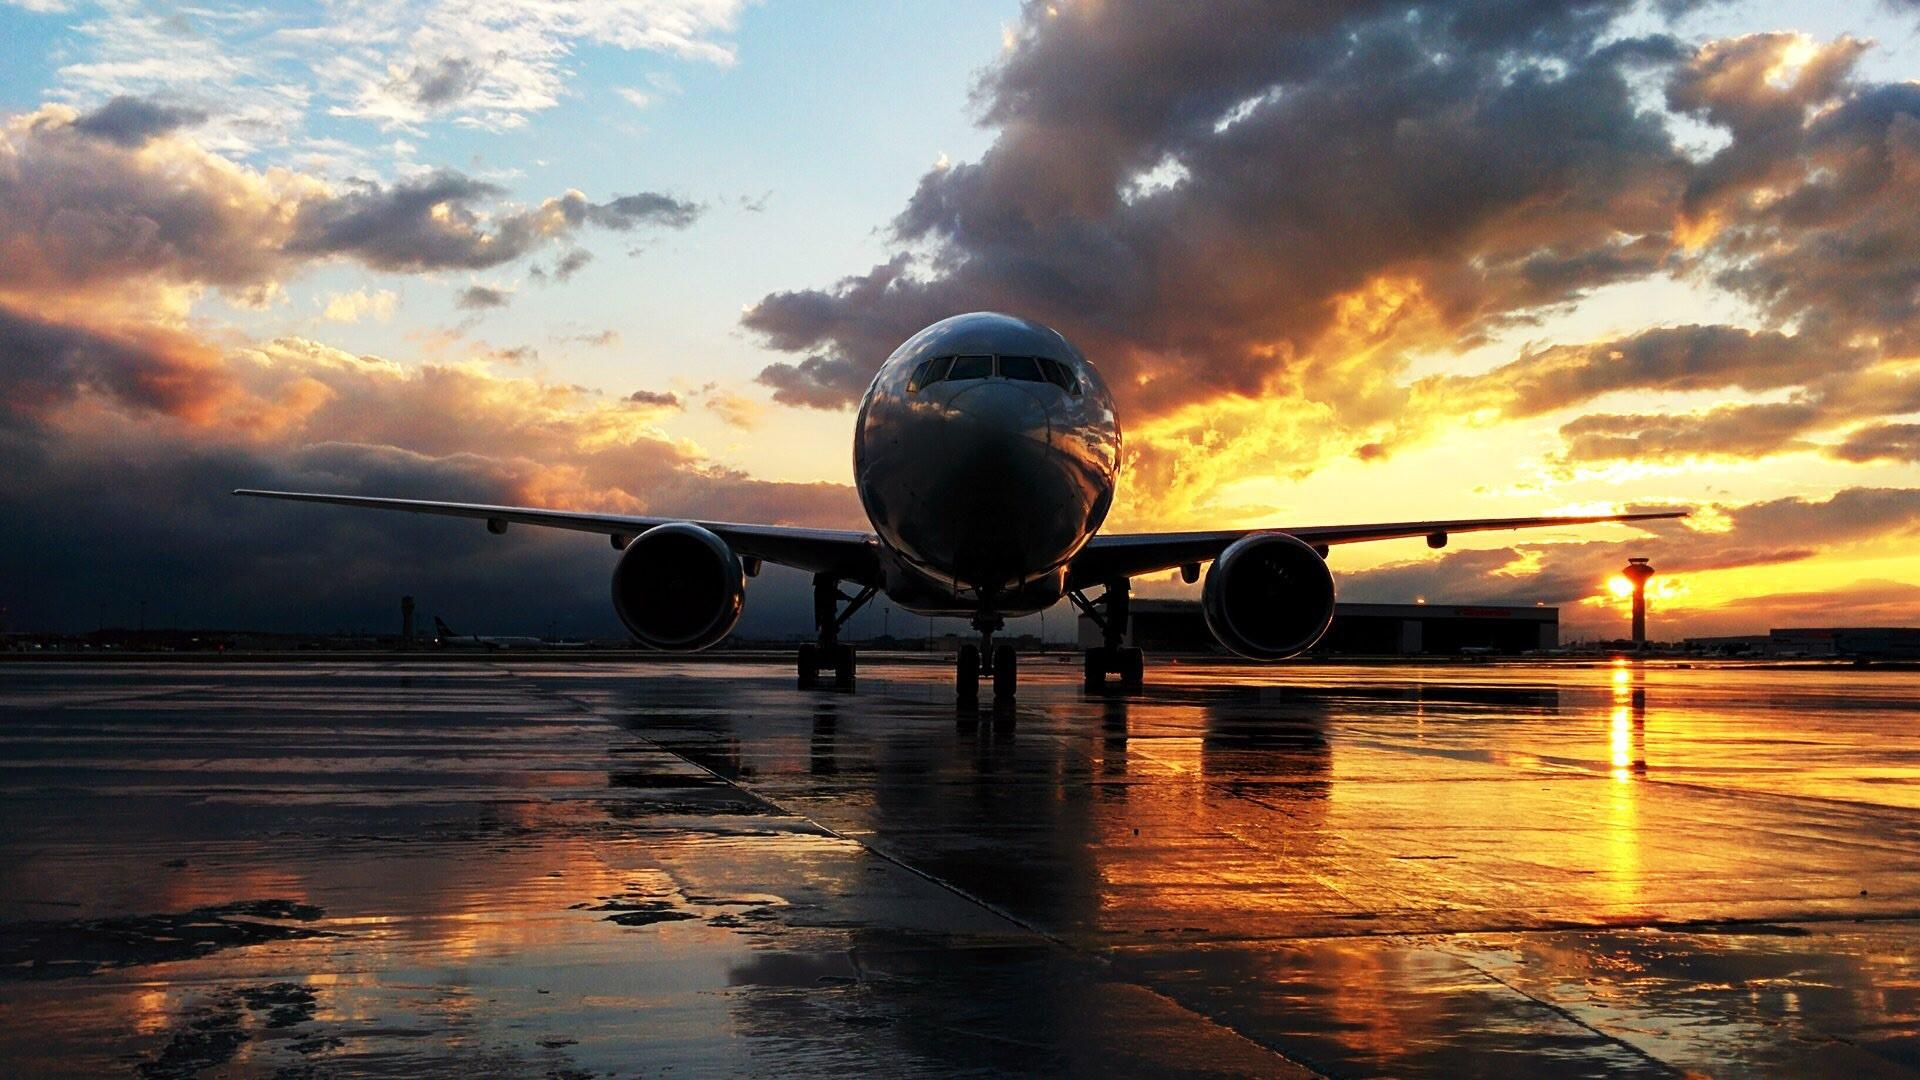 Airplane at sunset wallpaper